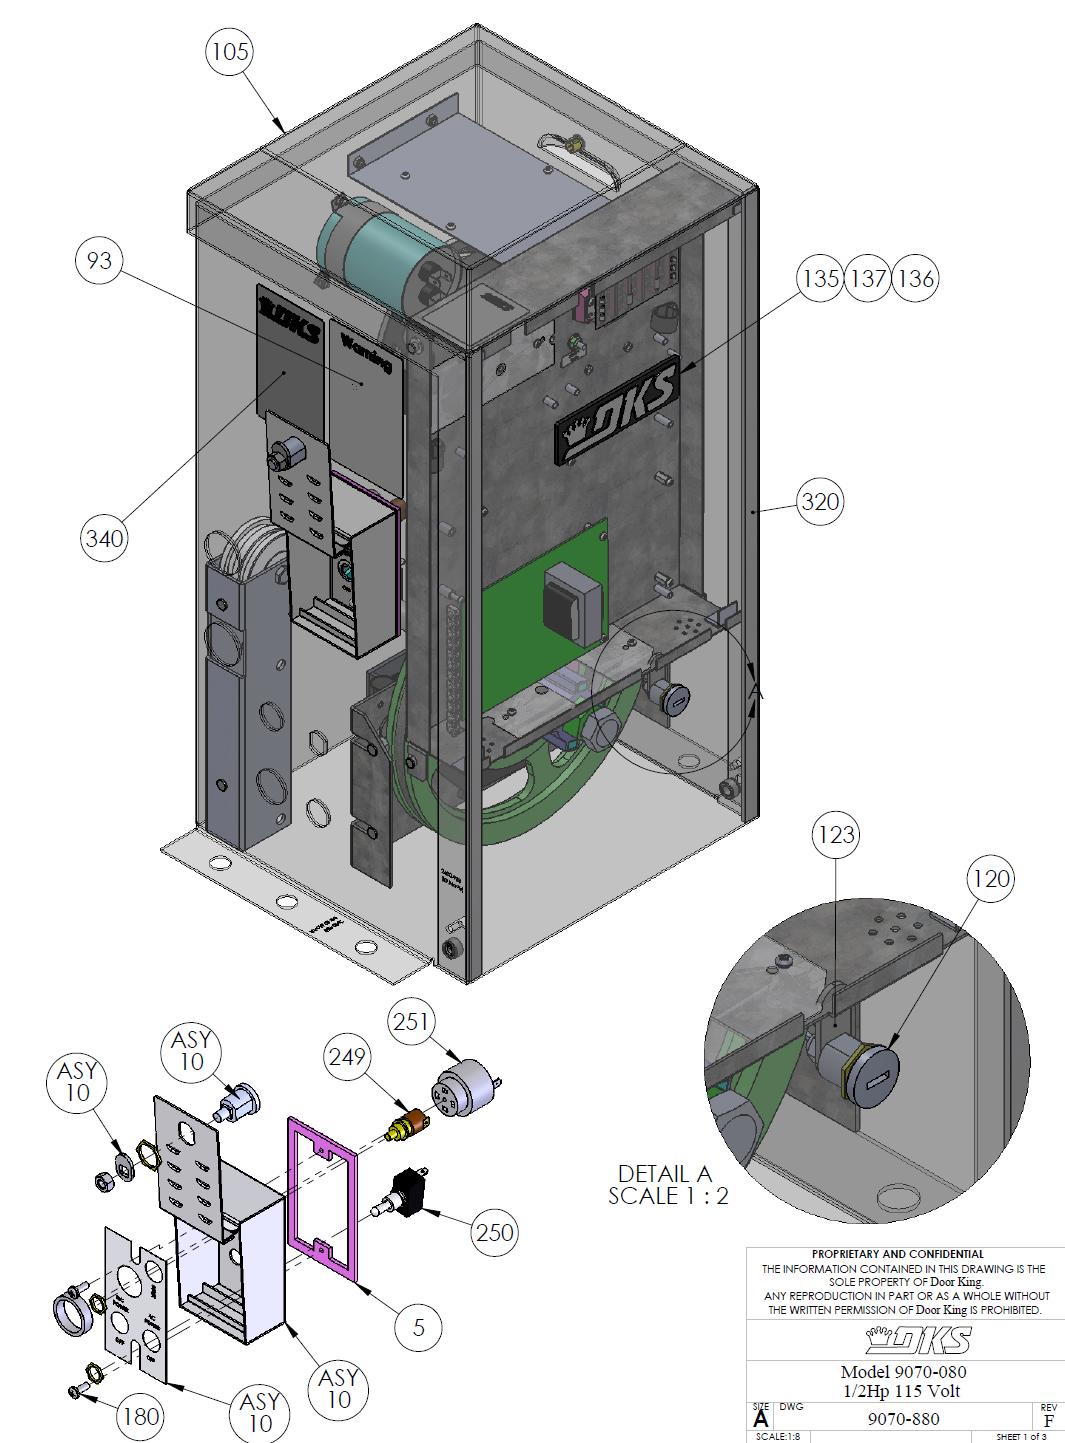 Doorking Parts - 9070-080  sc 1 st  L.A Ornamental & Doorking Parts Slide Gate Operator 9070-080 Doorking Replacement Parts